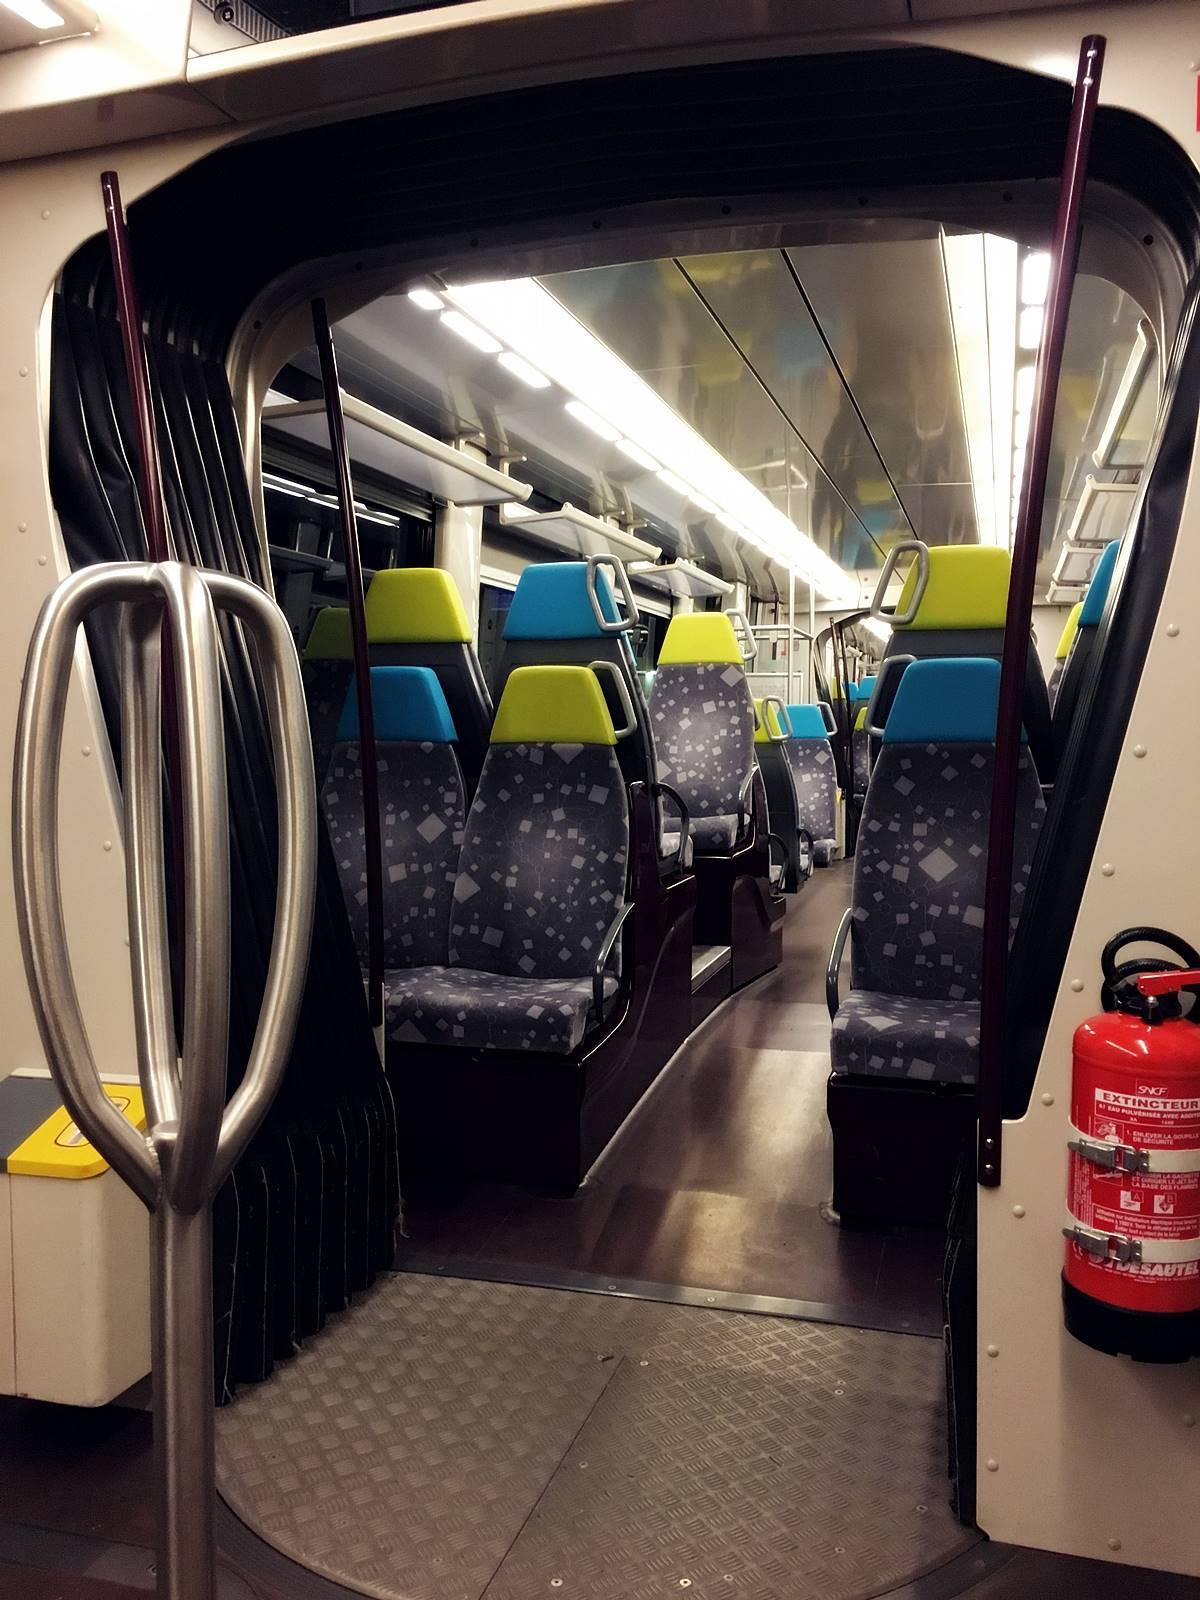 Teste tram train chateaubriant nantes 3